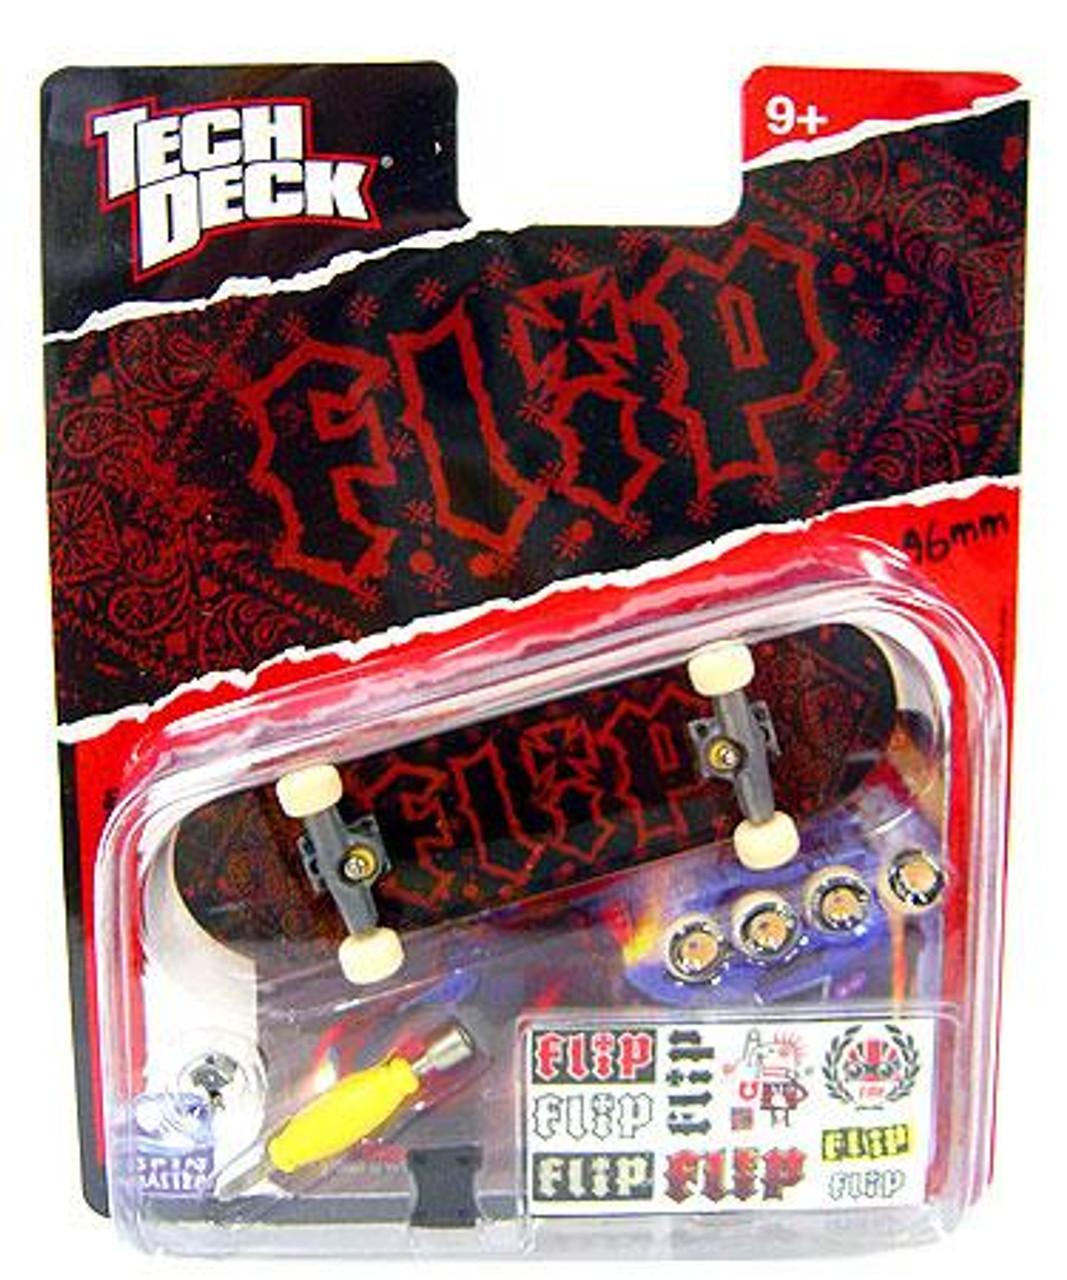 Tech Deck Flip 96mm Mini Skateboard [Red & Black Bandana]